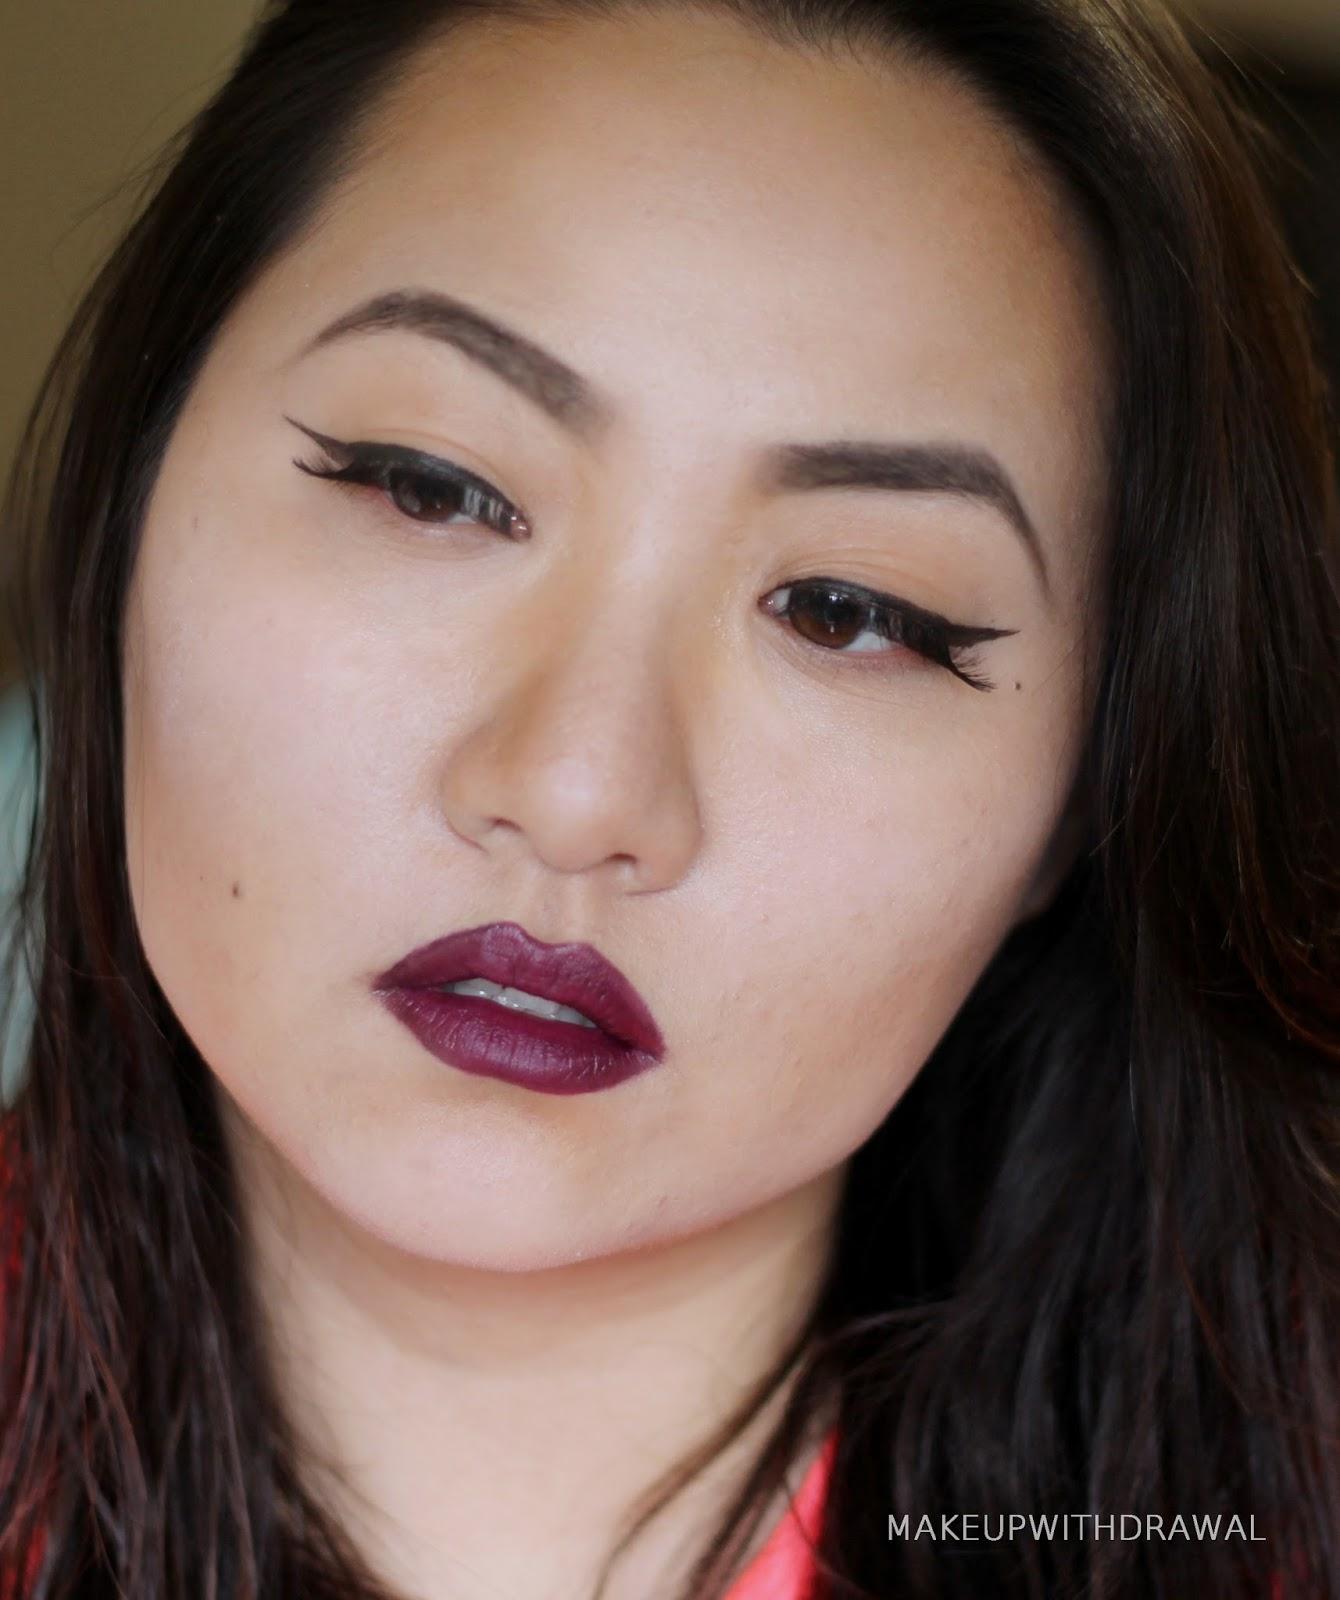 FOTD feat. Impulse Cosmetics Pandora   Makeup Withdrawal   Bloglovin'